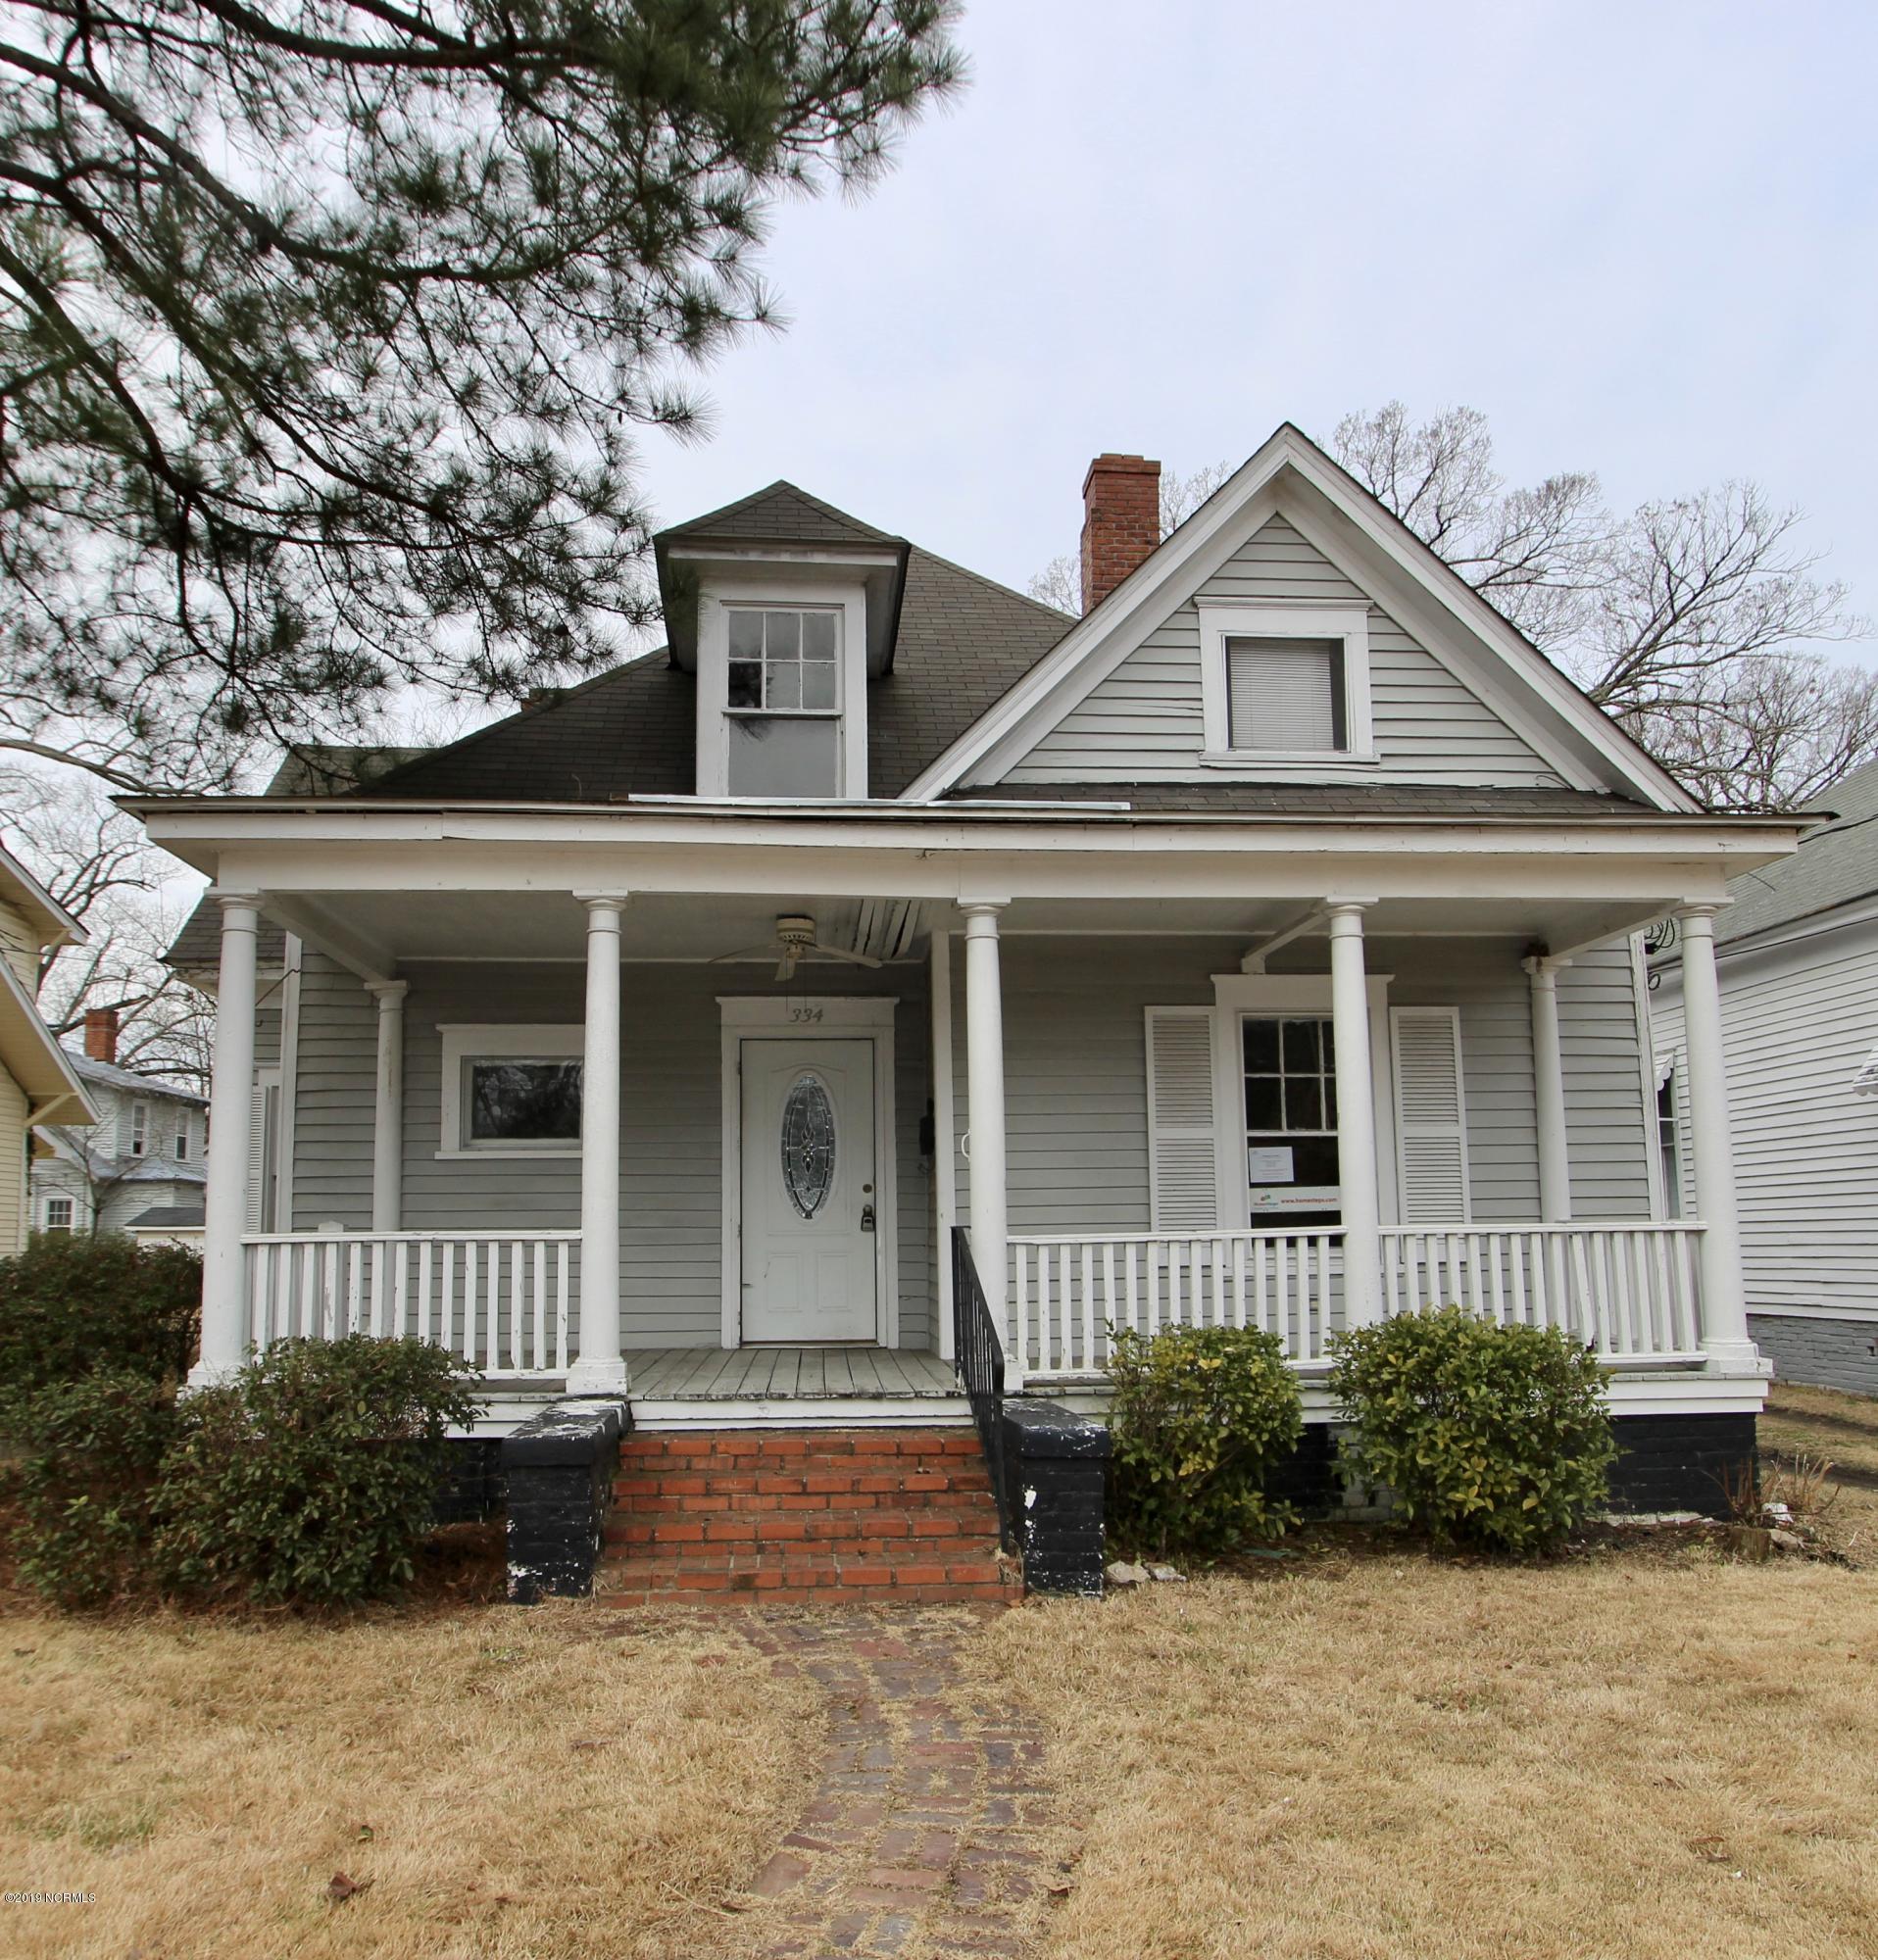 334 Villa Street, Rocky Mount, North Carolina, 2 Bedrooms Bedrooms, 5 Rooms Rooms,2 BathroomsBathrooms,Single family residence,For sale,Villa,100155009